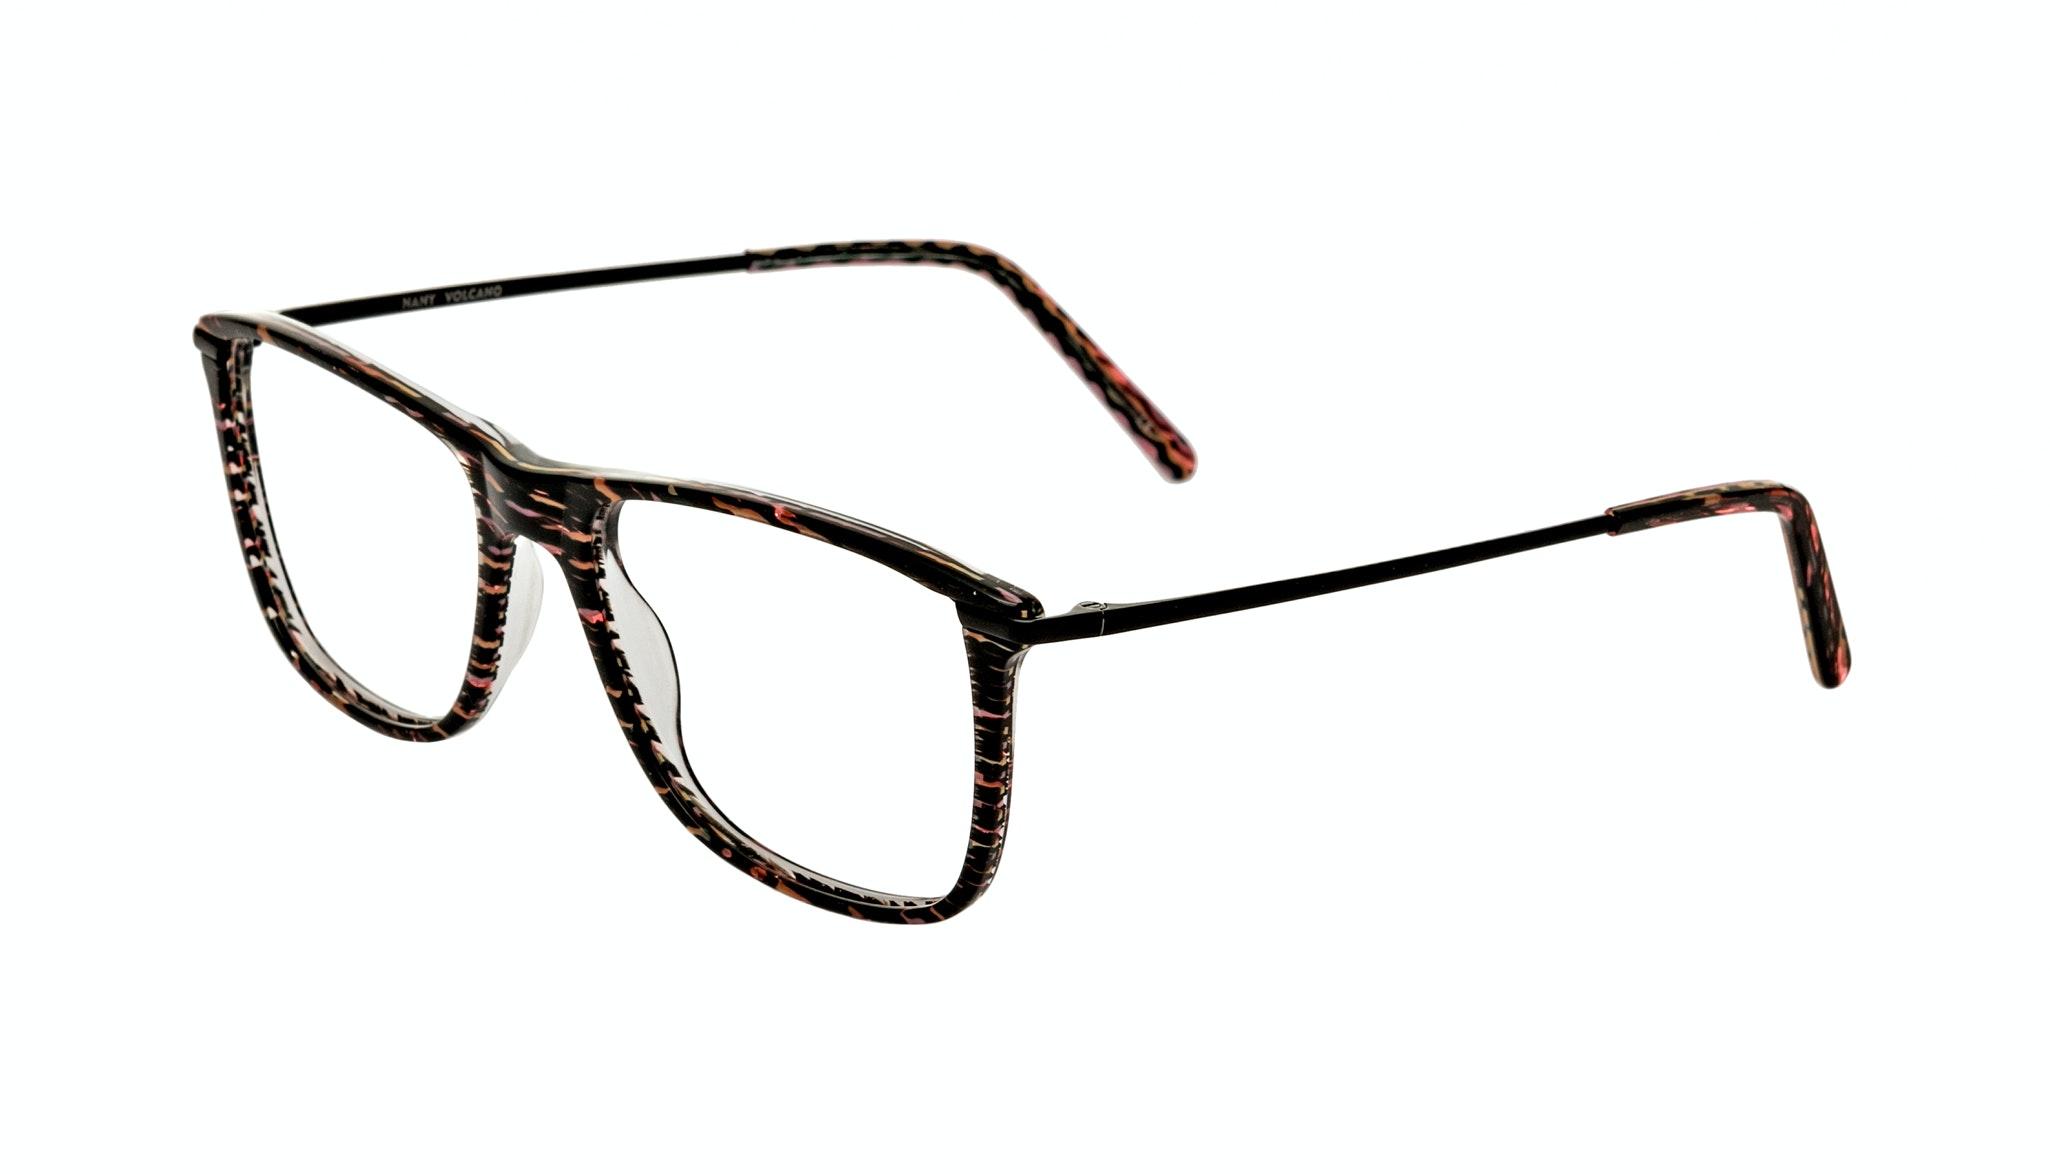 Affordable Fashion Glasses Rectangle Eyeglasses Women Nany Volcano Tilt